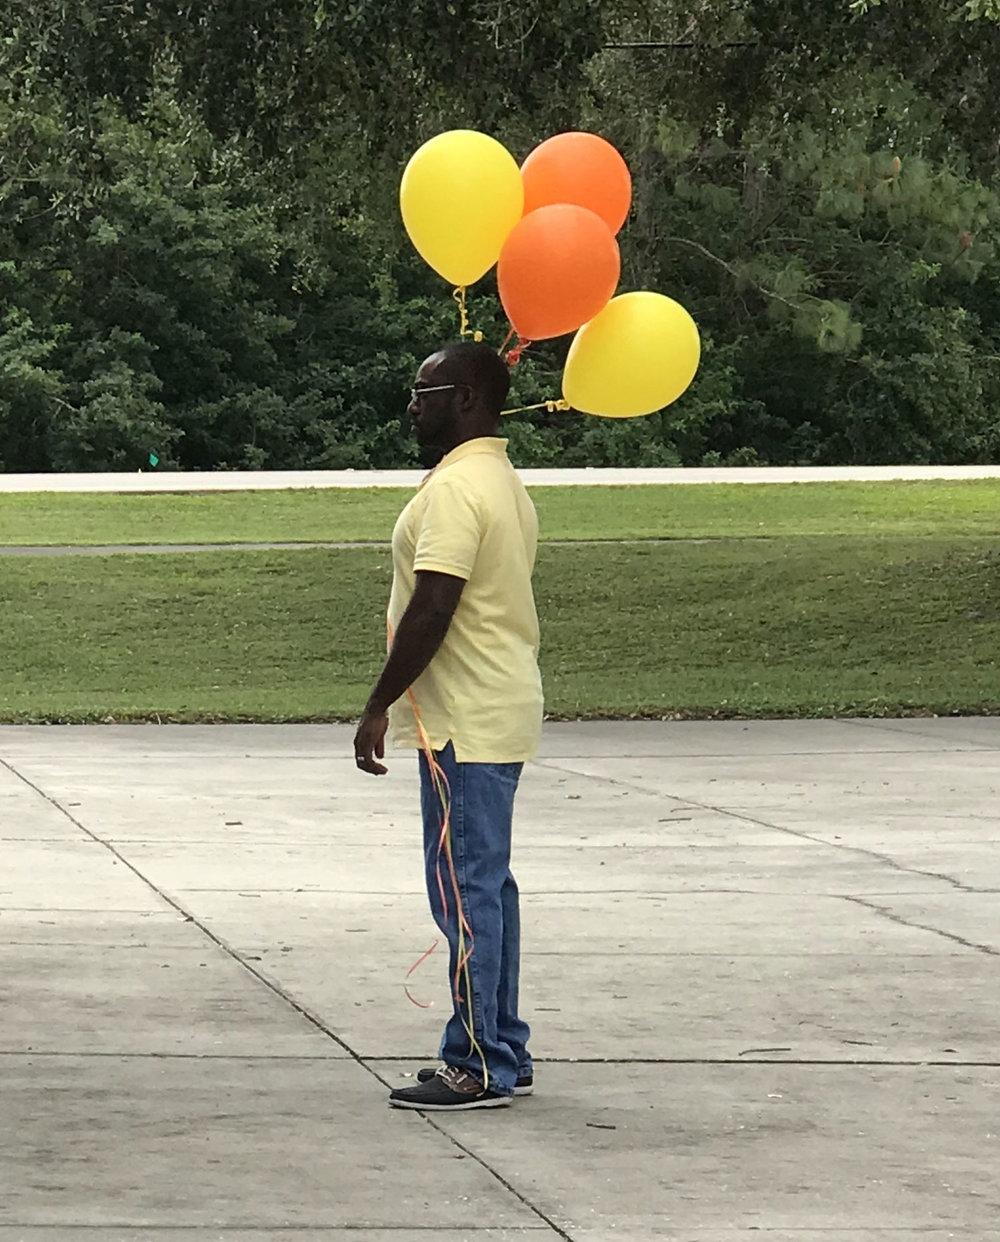 ff-balloons.jpg